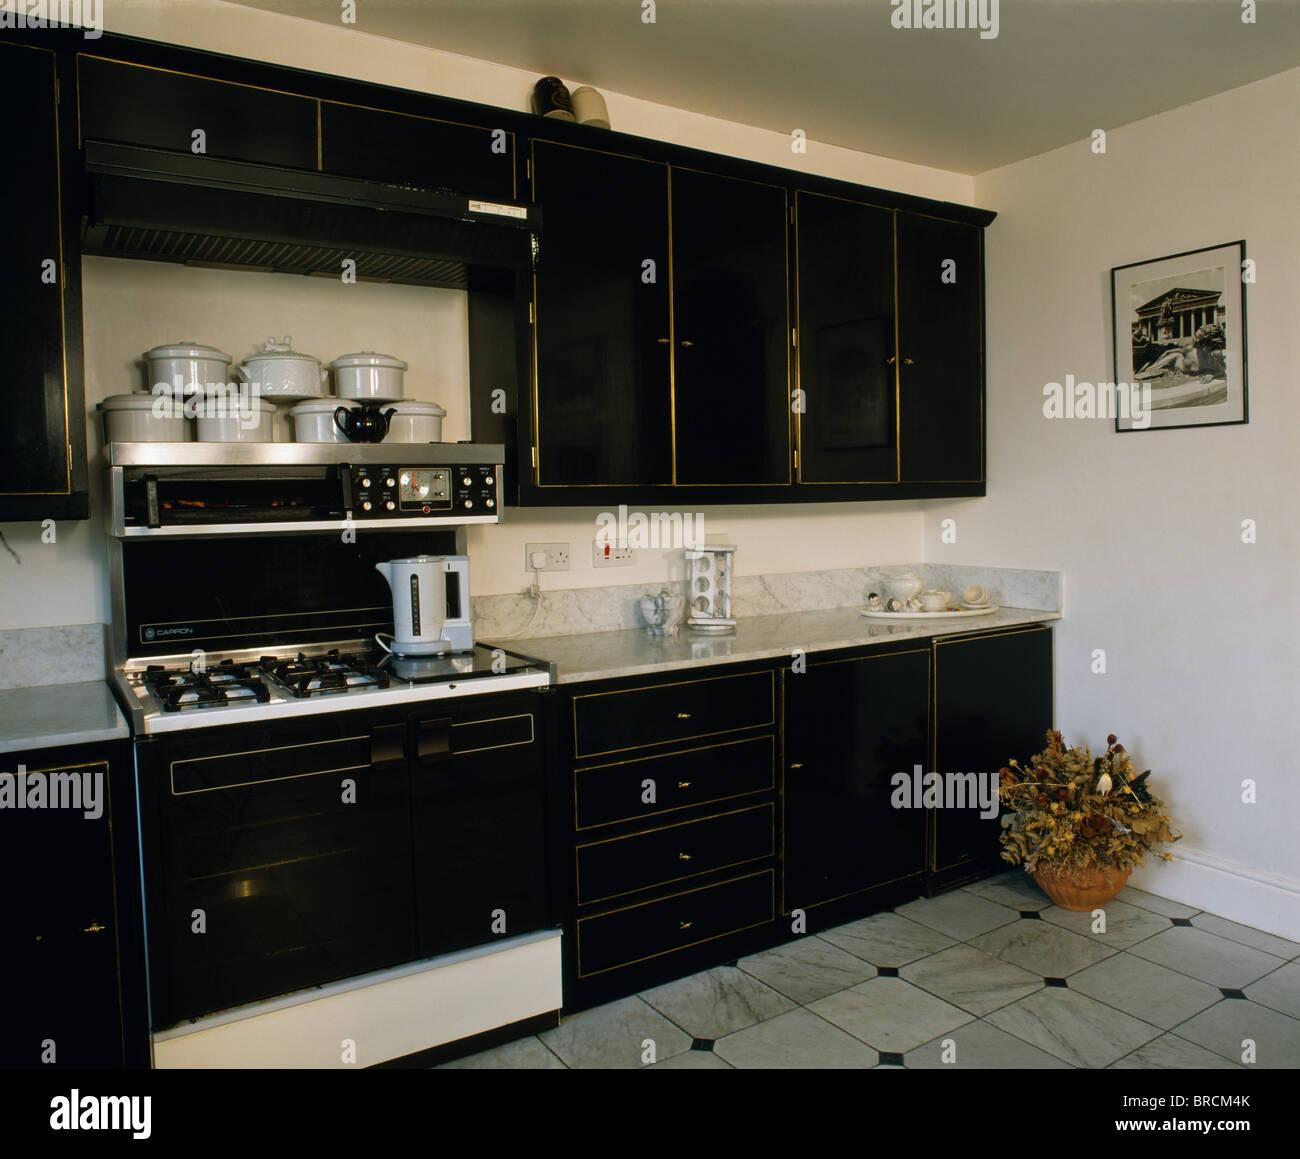 Appliance Black Monochromatic Oven Stockfotos & Appliance Black ...